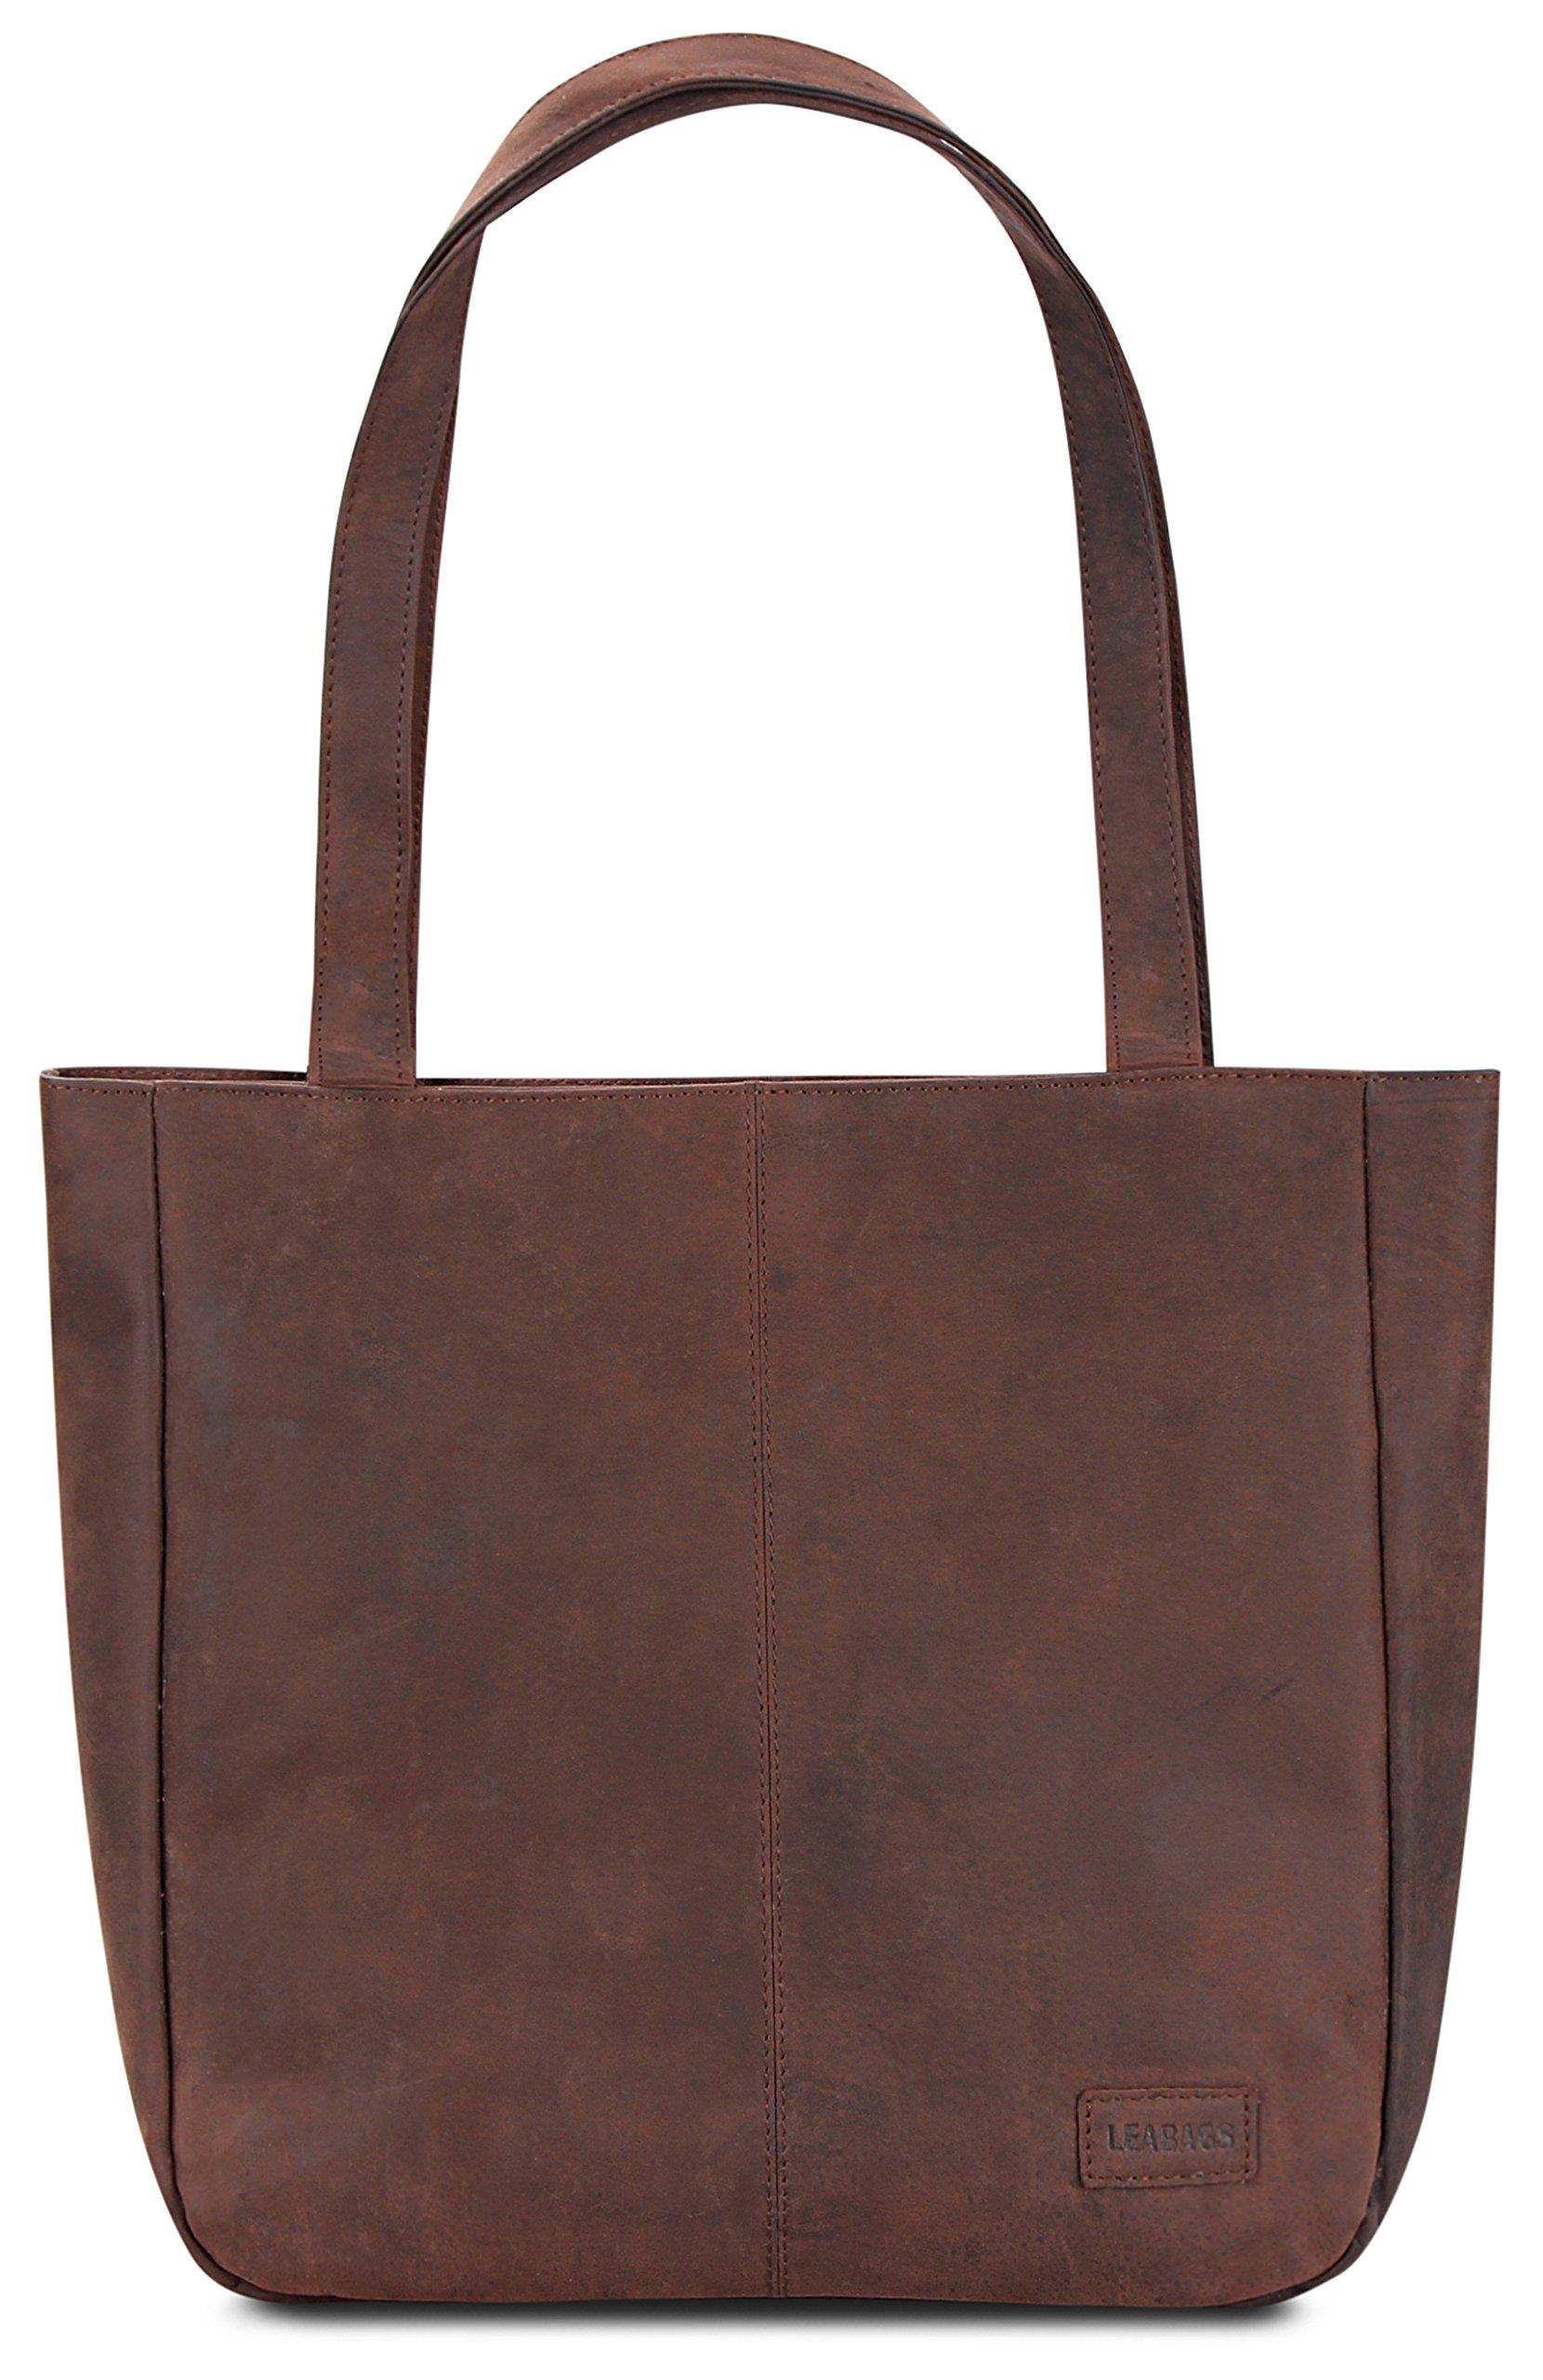 LEABAGS Darlington genuine buffalo leather shopper bag in vintage style - Nutmeg